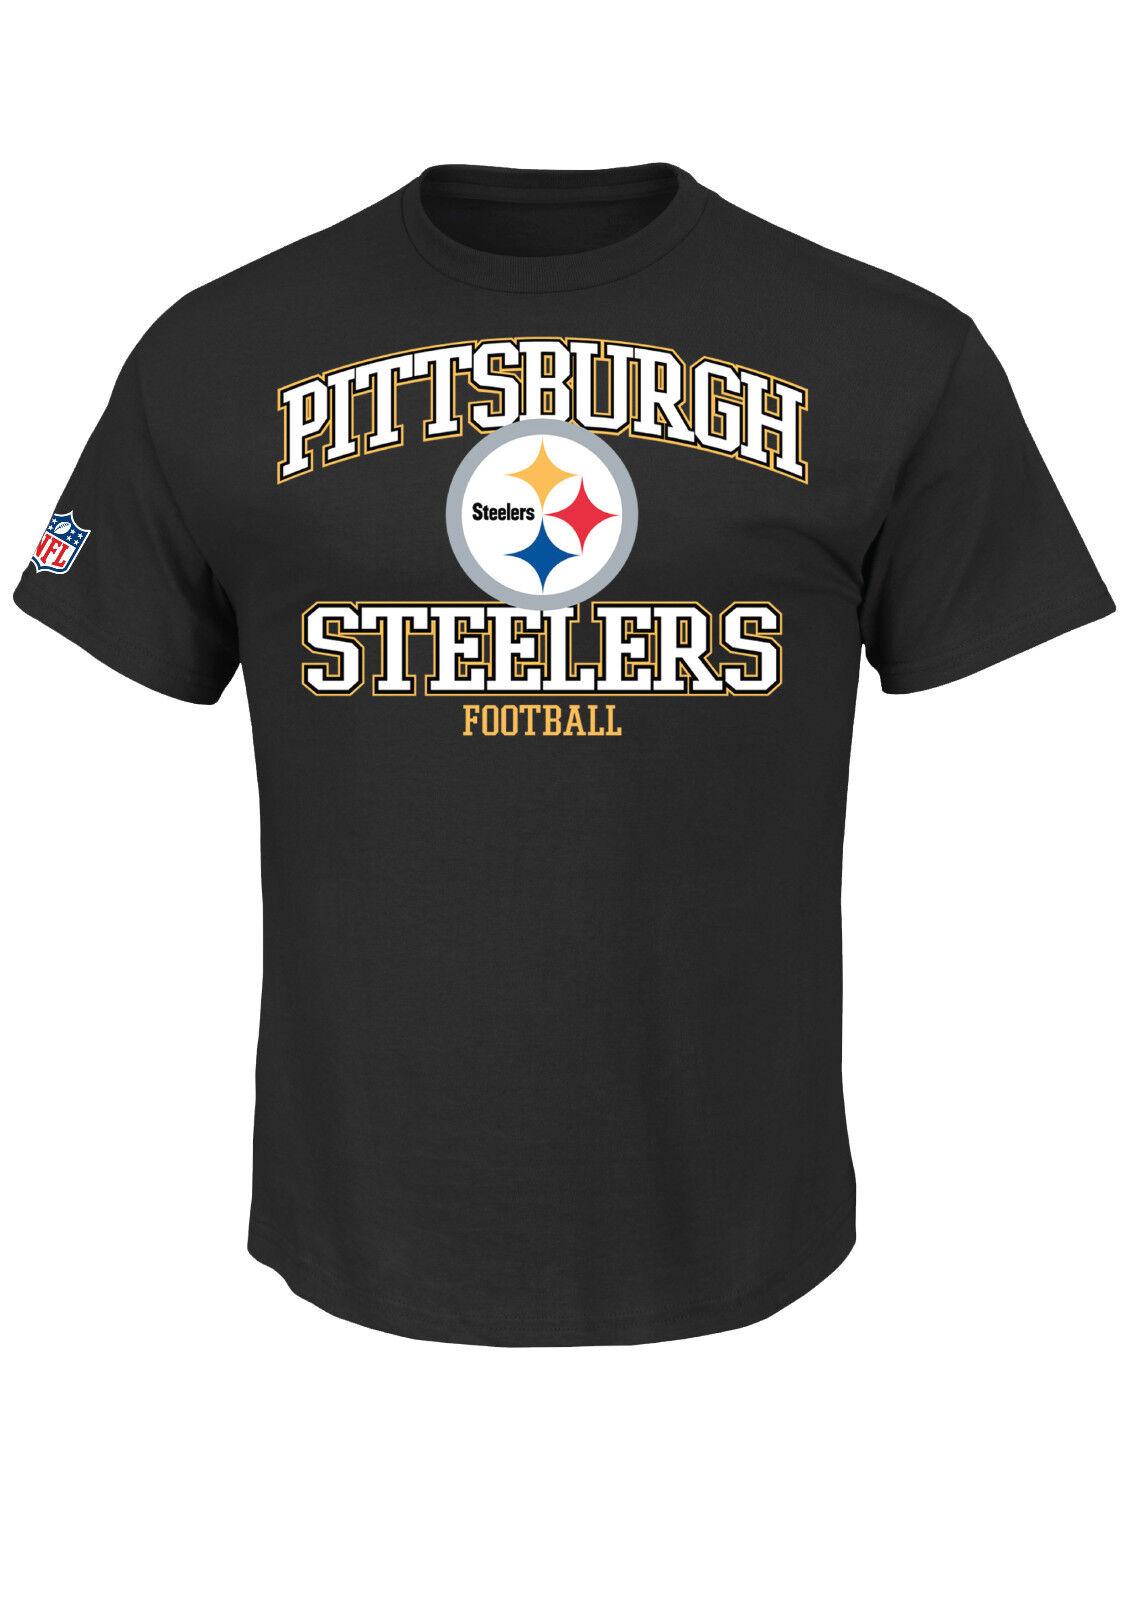 NFL Football Pittsburgh Pittsburgh Pittsburgh Steelers T-Shirt Tee Greatness schwarz bd0171